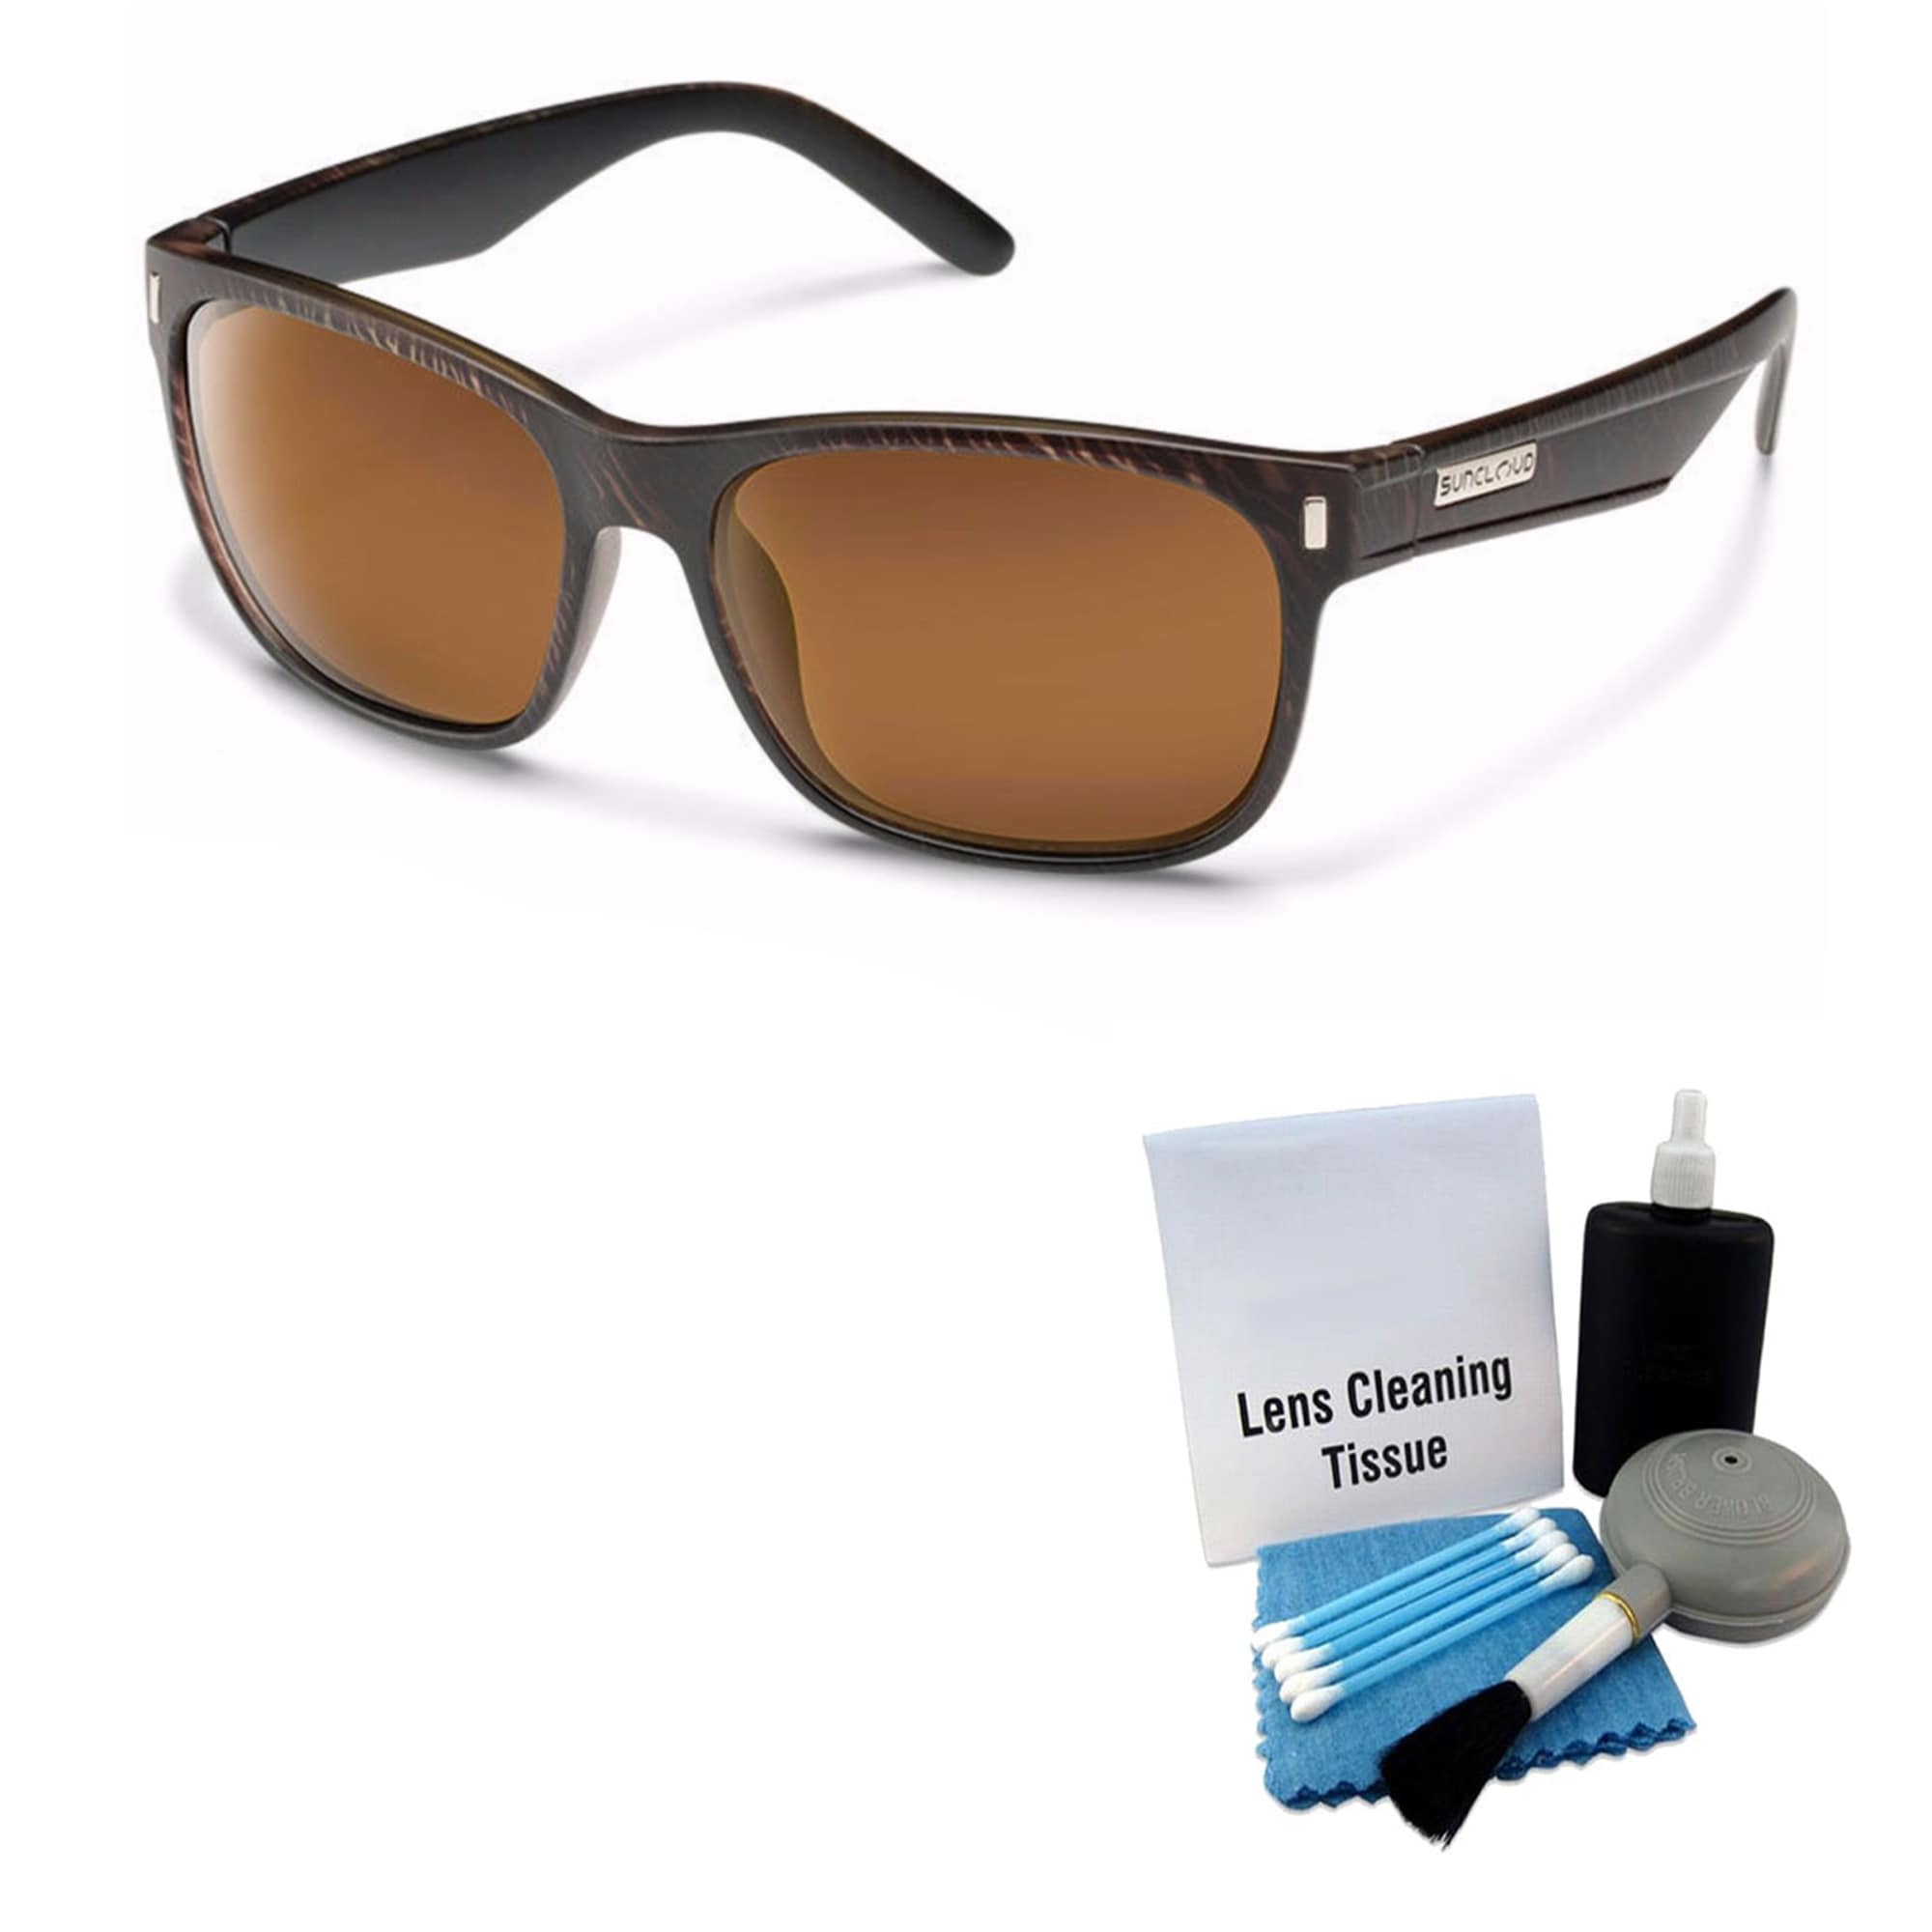 160c29a81a Tortoise Men s Sunglasses